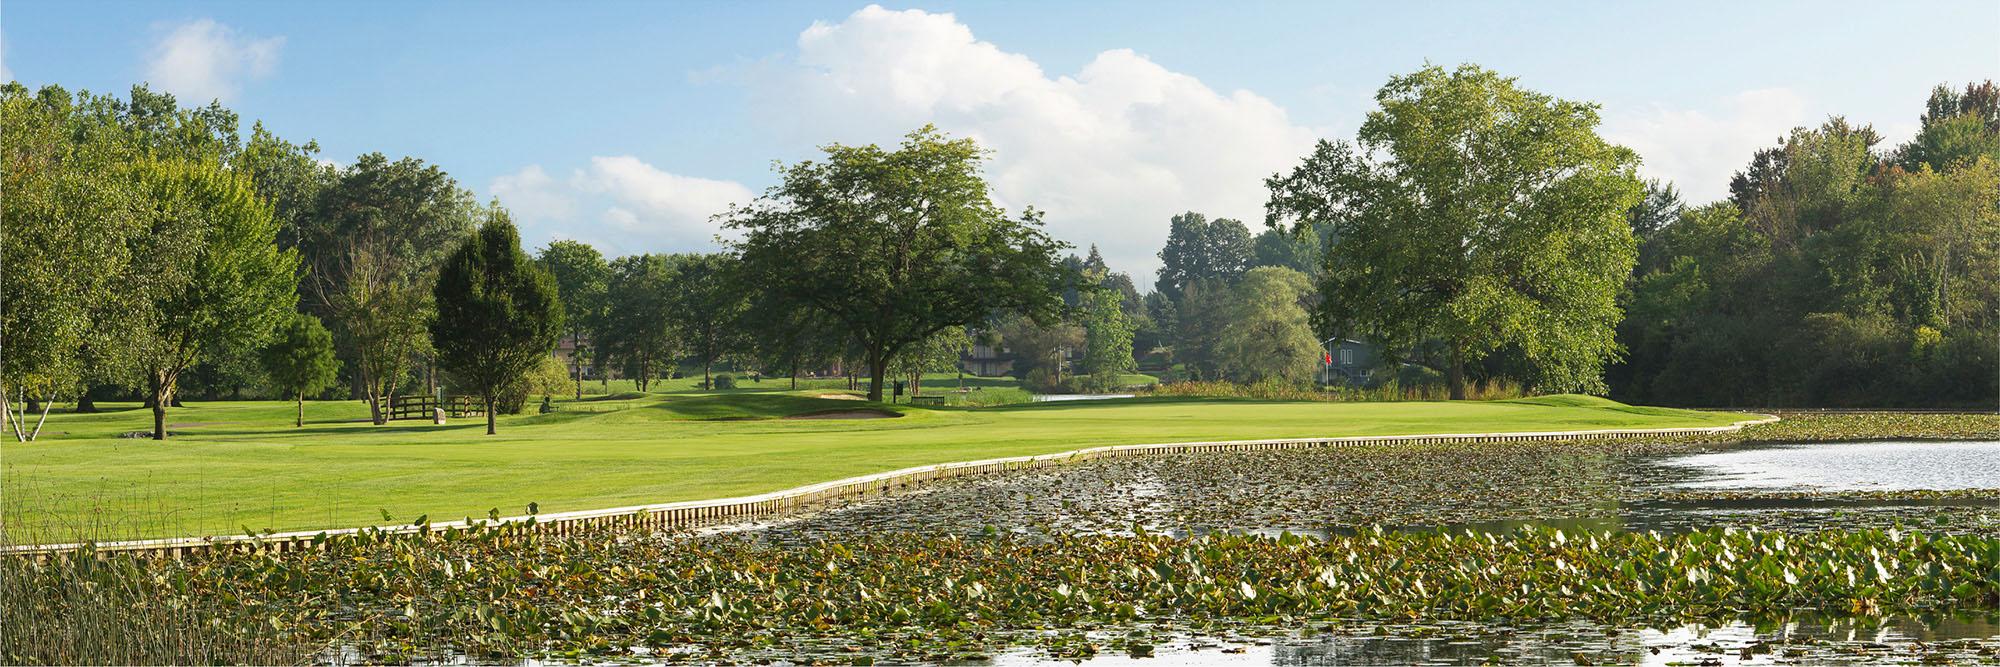 Golf Course Image - South Bend No. 17